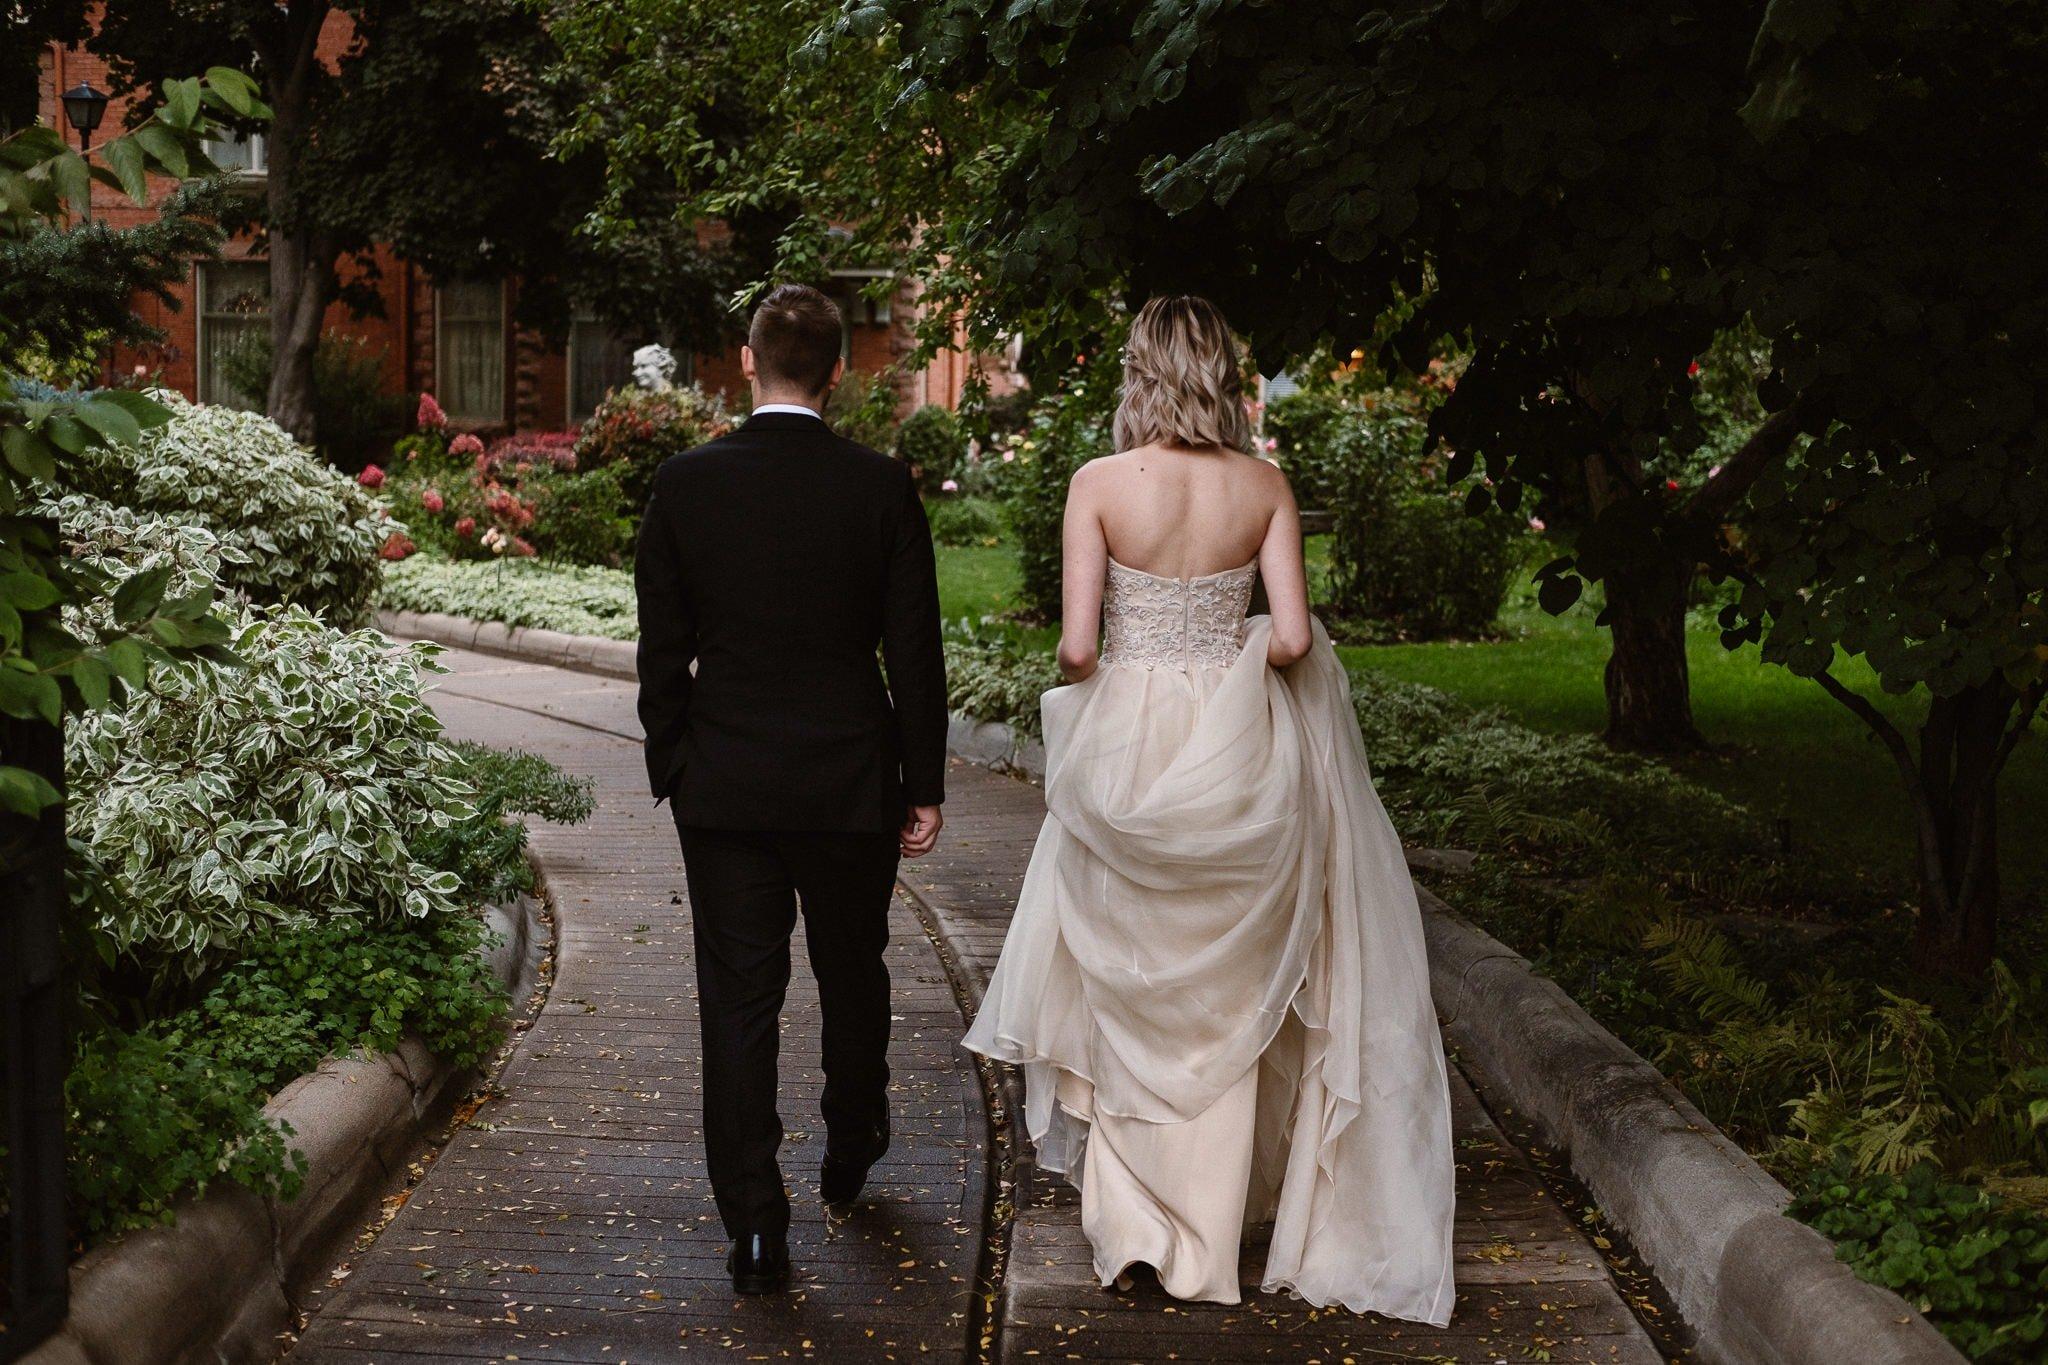 St Vrain Wedding Photographer | Longmont Wedding Photographer | Colorado Winter Wedding Photographer, Colorado industrial chic wedding, bride and groom portraits